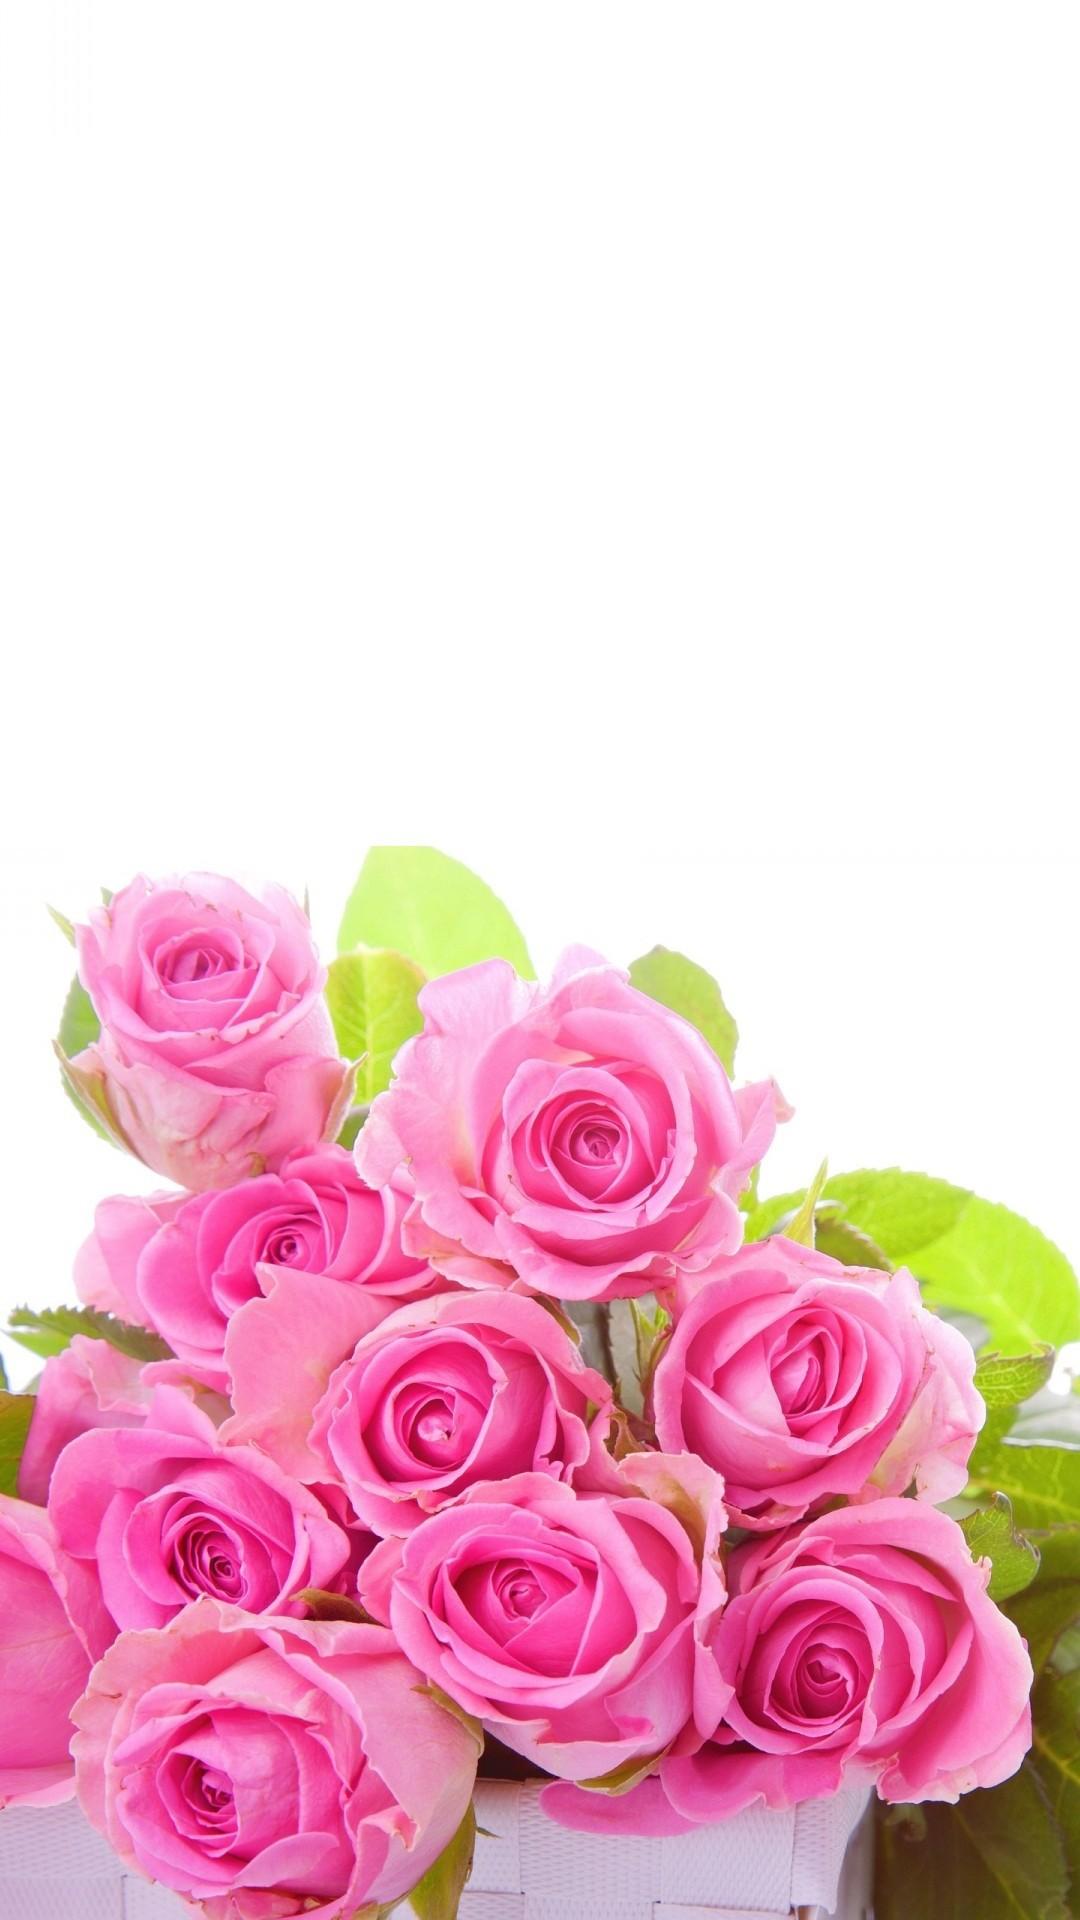 1920x1080 Pink Rose Wallpaper HD 46814